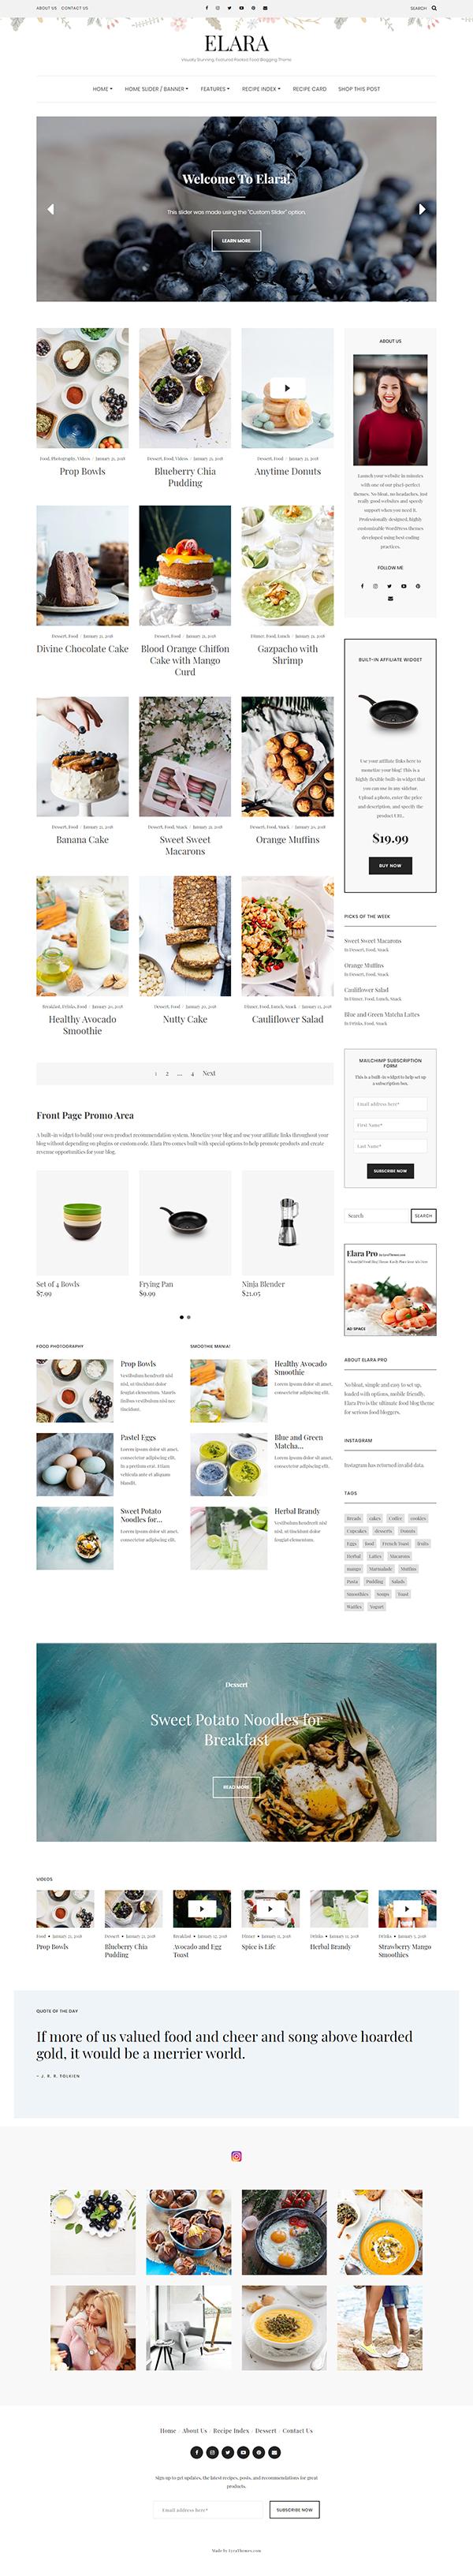 Elara - A Beautiful Food Blog Theme